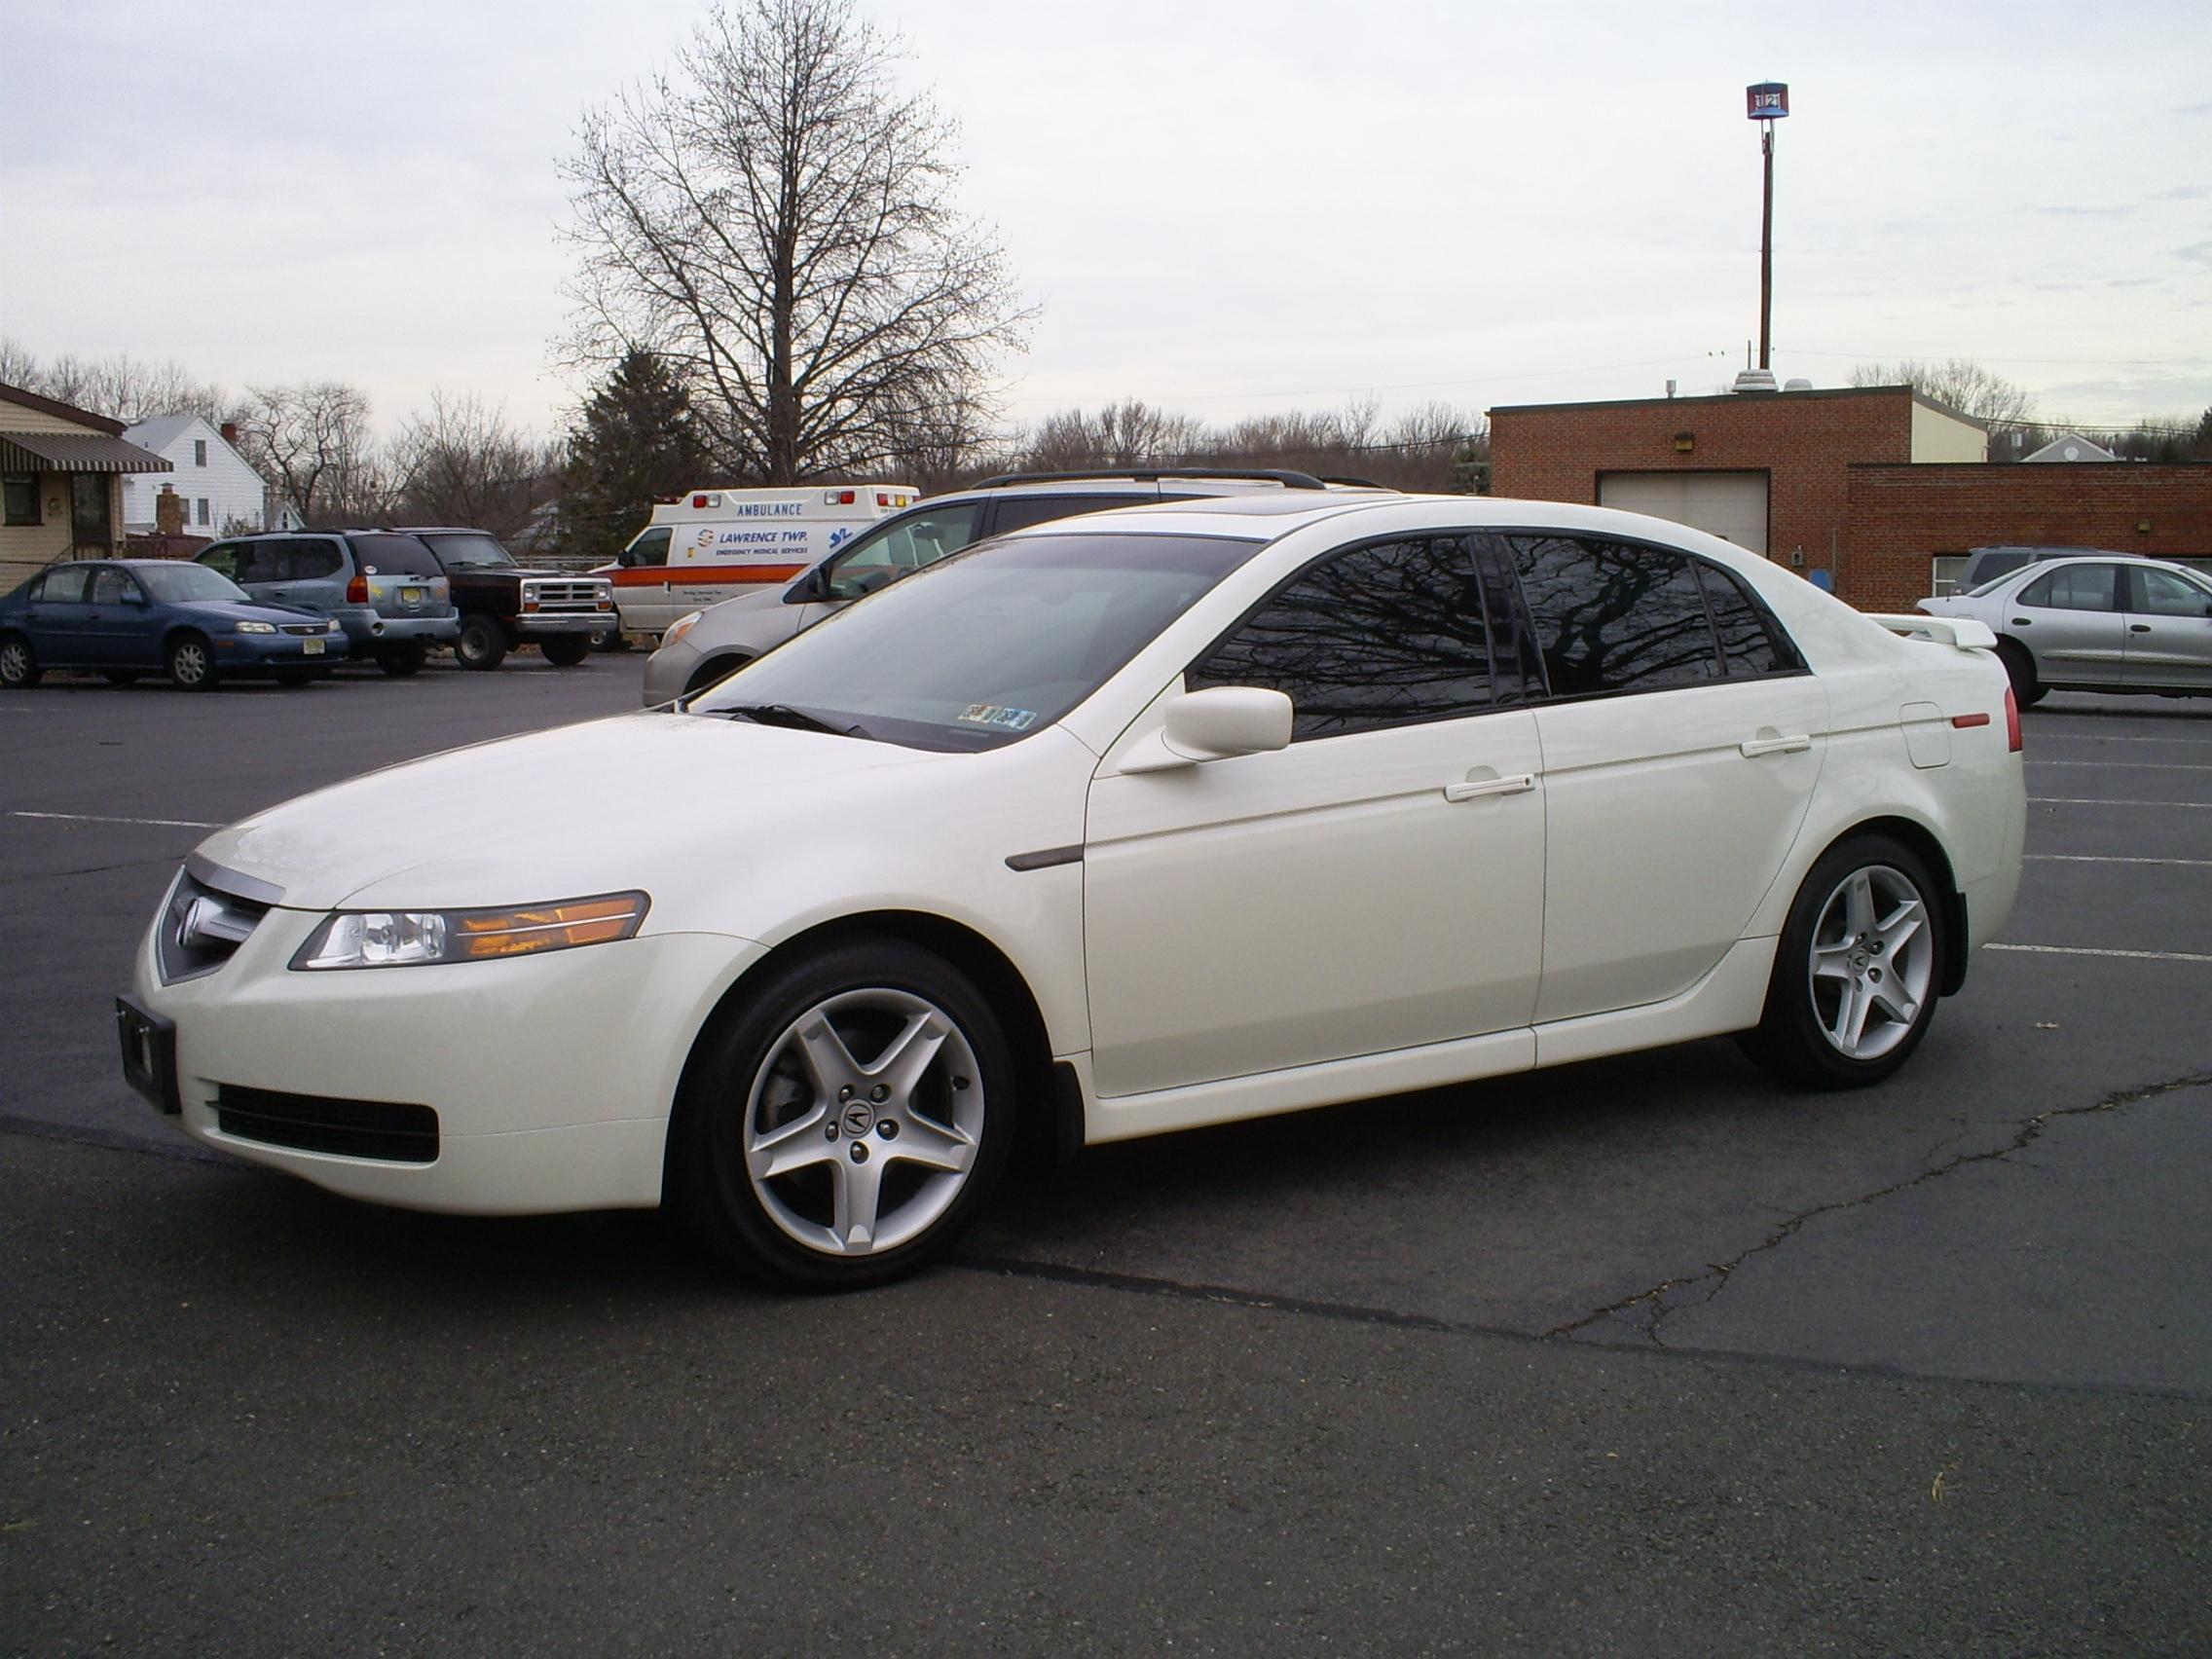 2005 Acura Tl Image 15